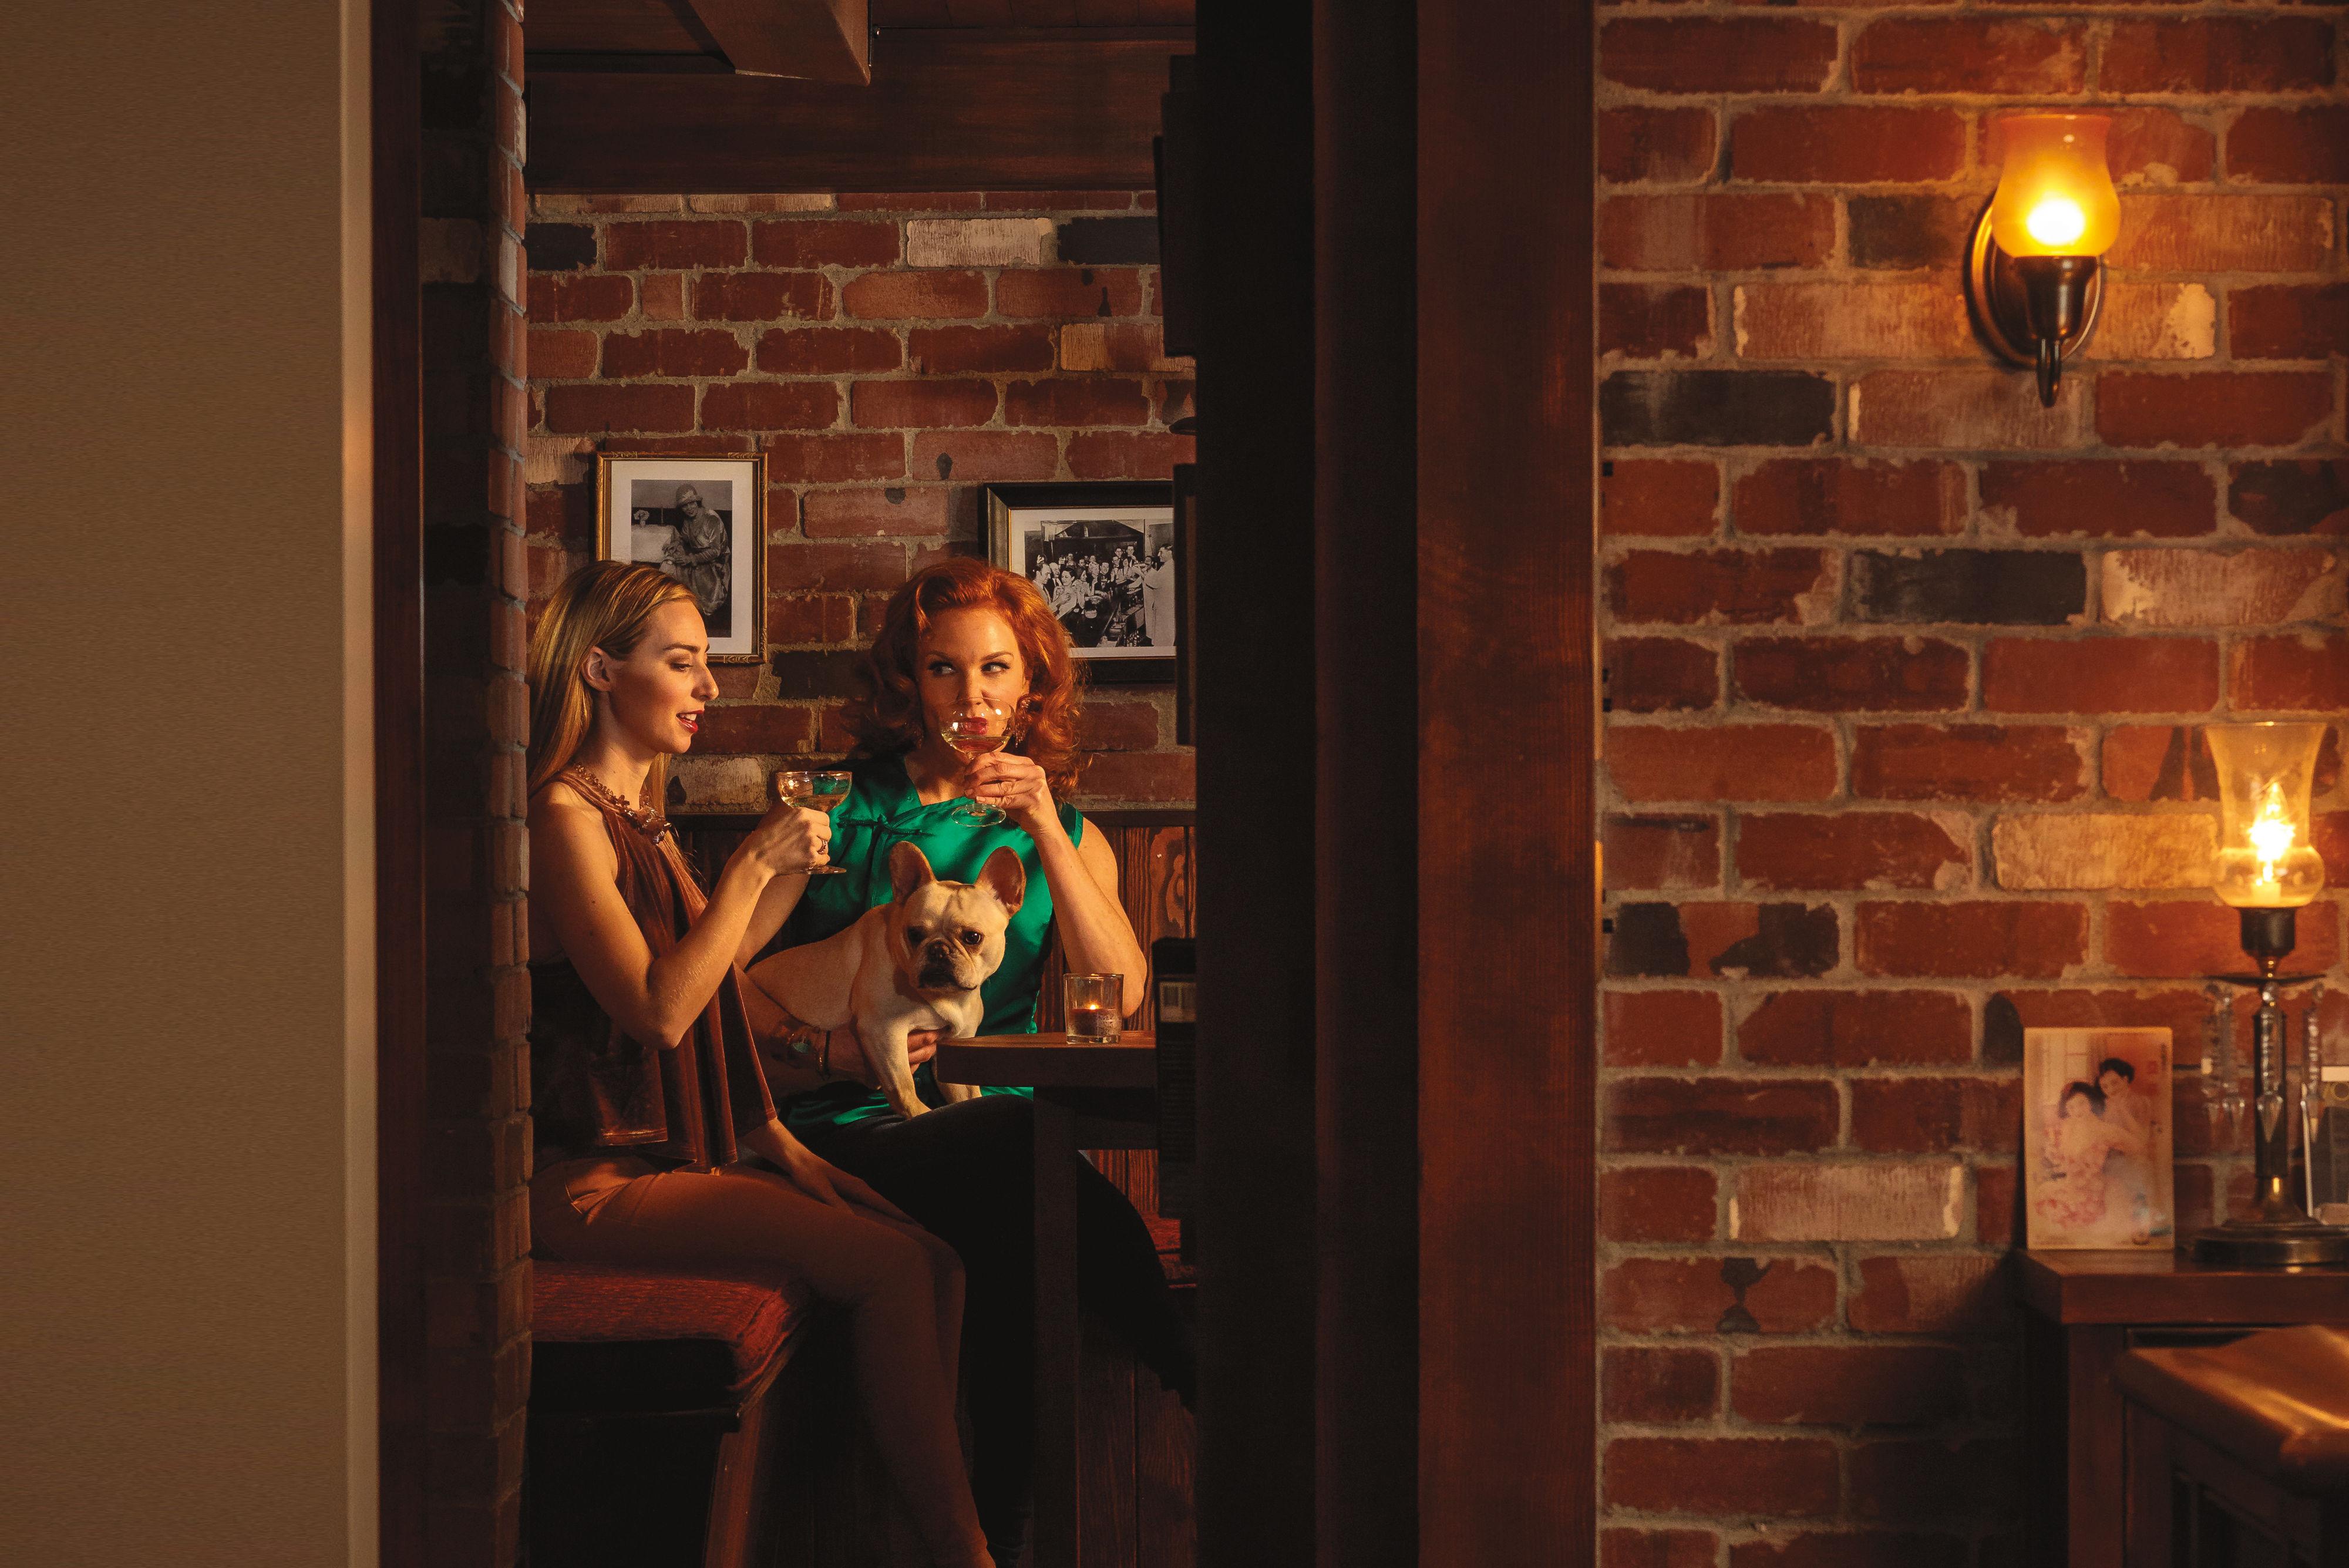 Pomo 0217 home bars opener gusivl